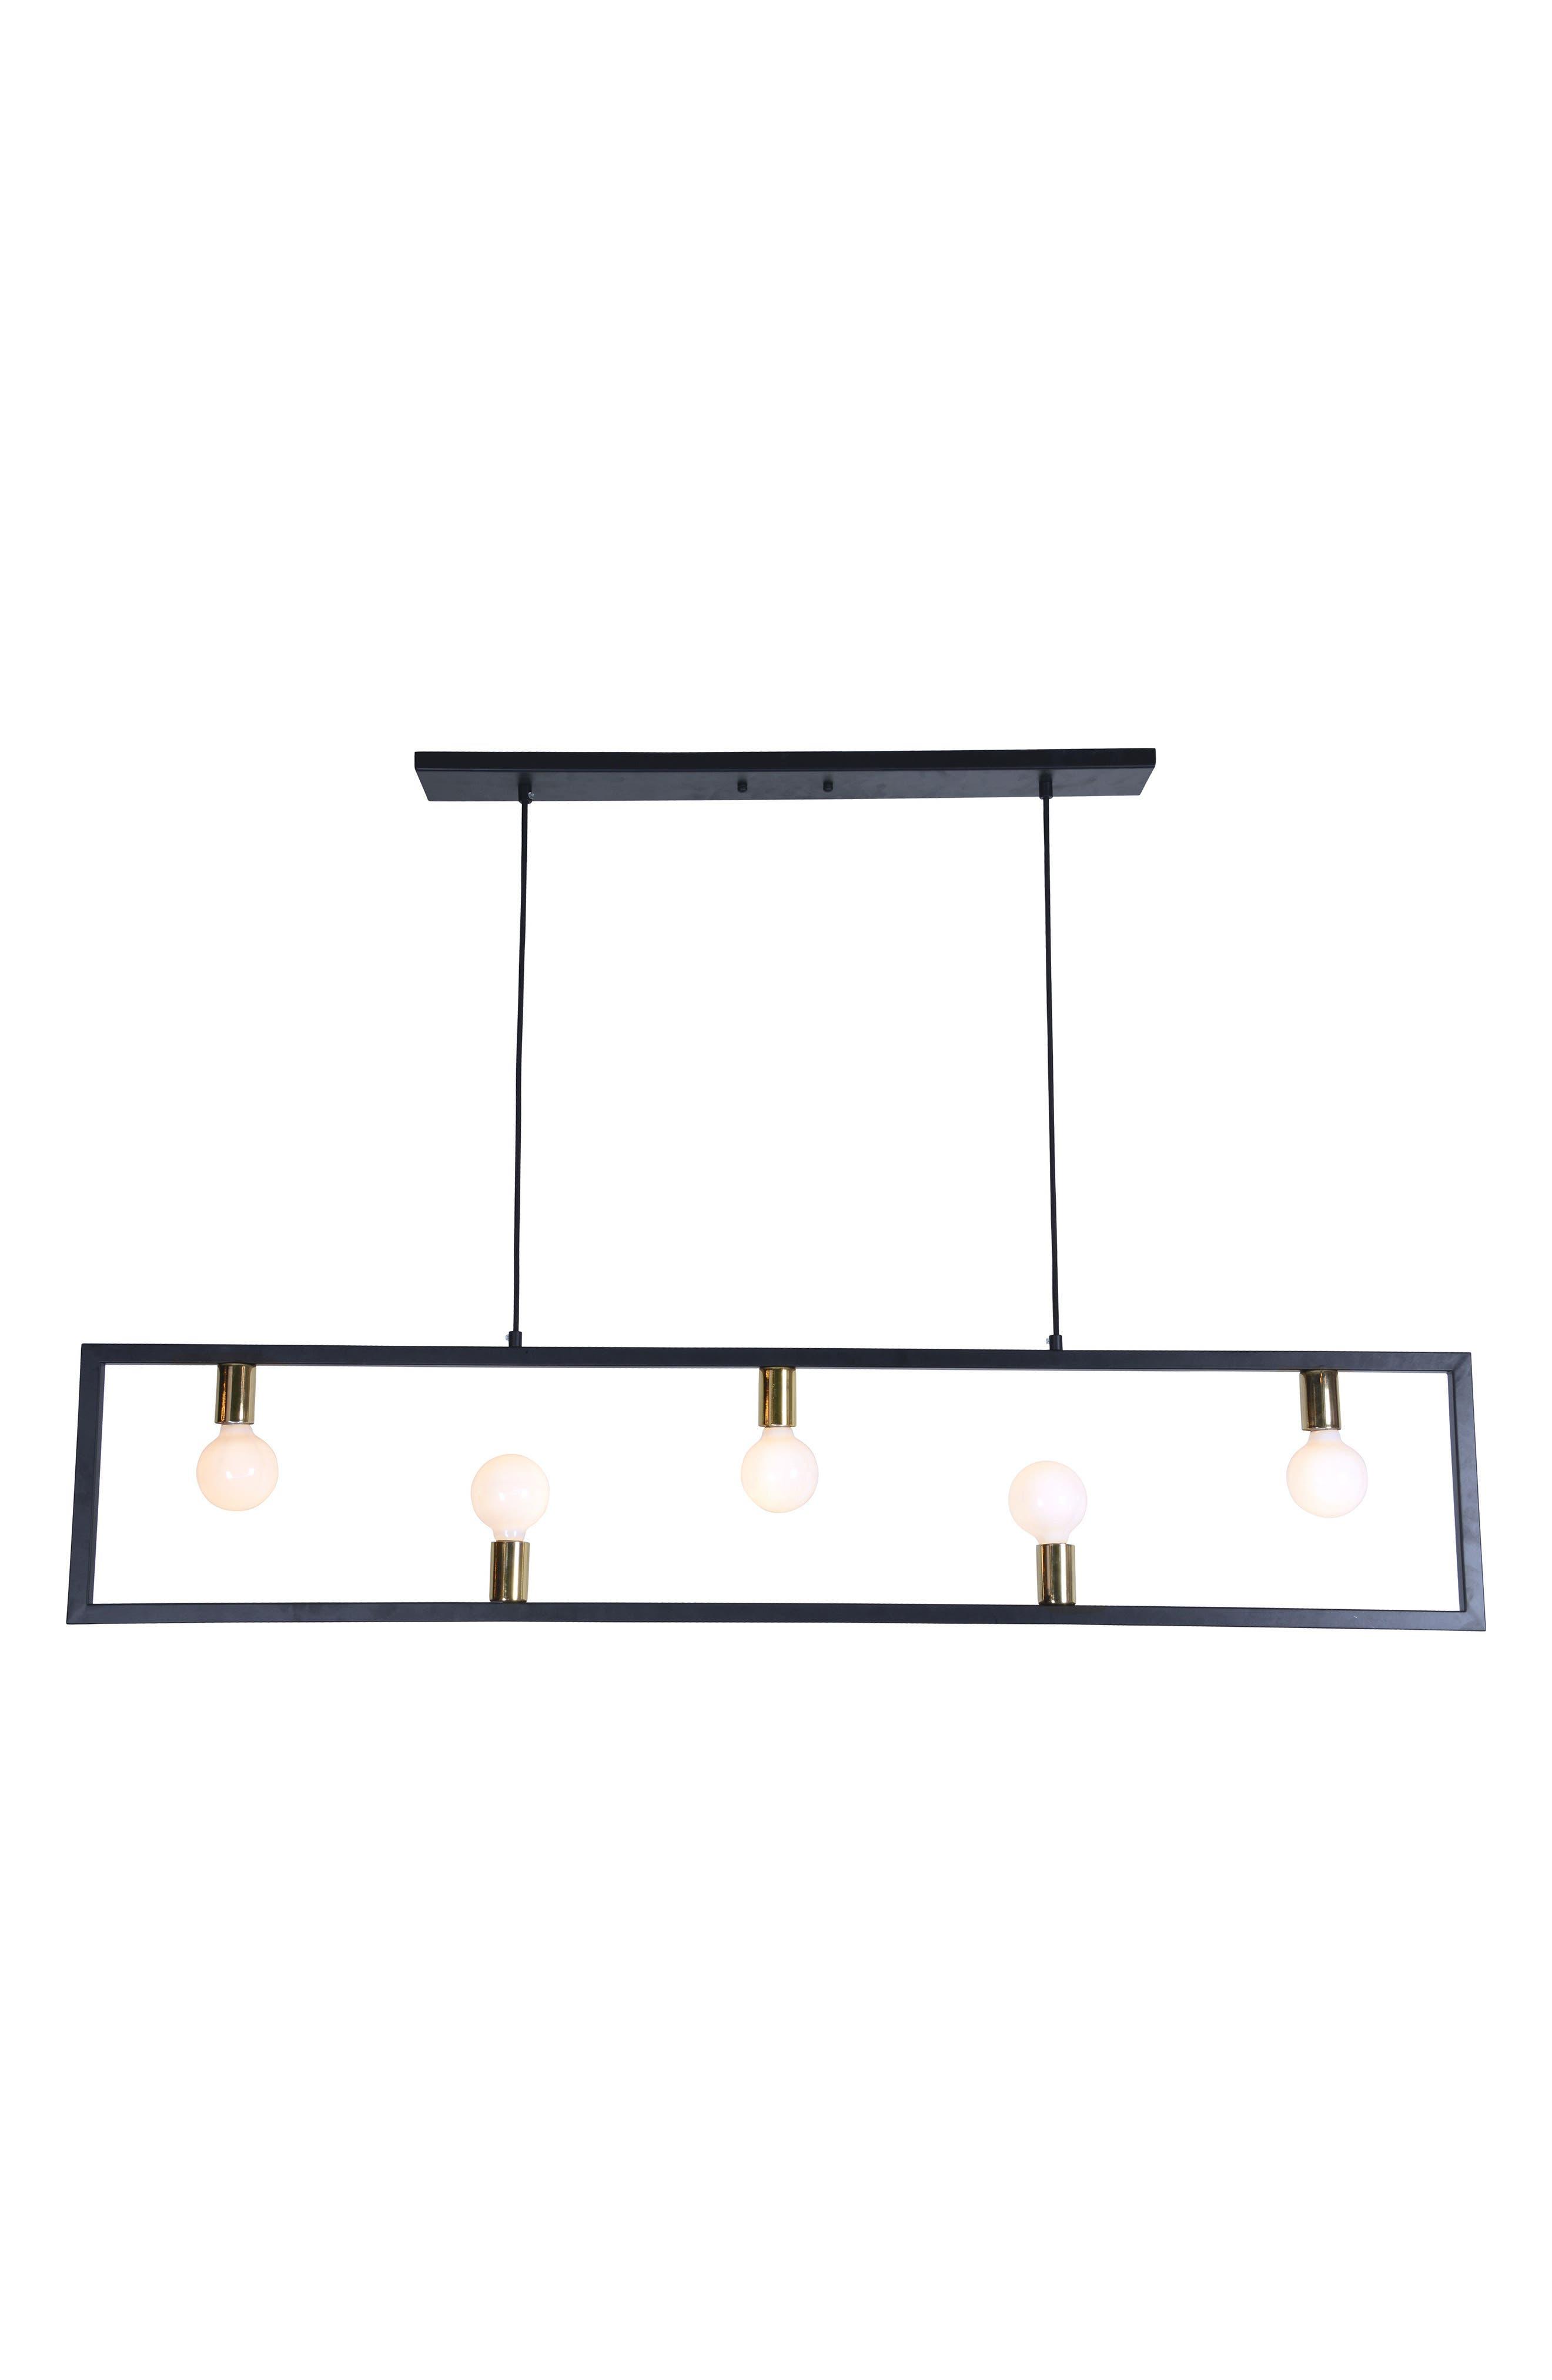 Vera Ceiling Light Fixture,                             Main thumbnail 1, color,                             Matte Black/ Polished Brass